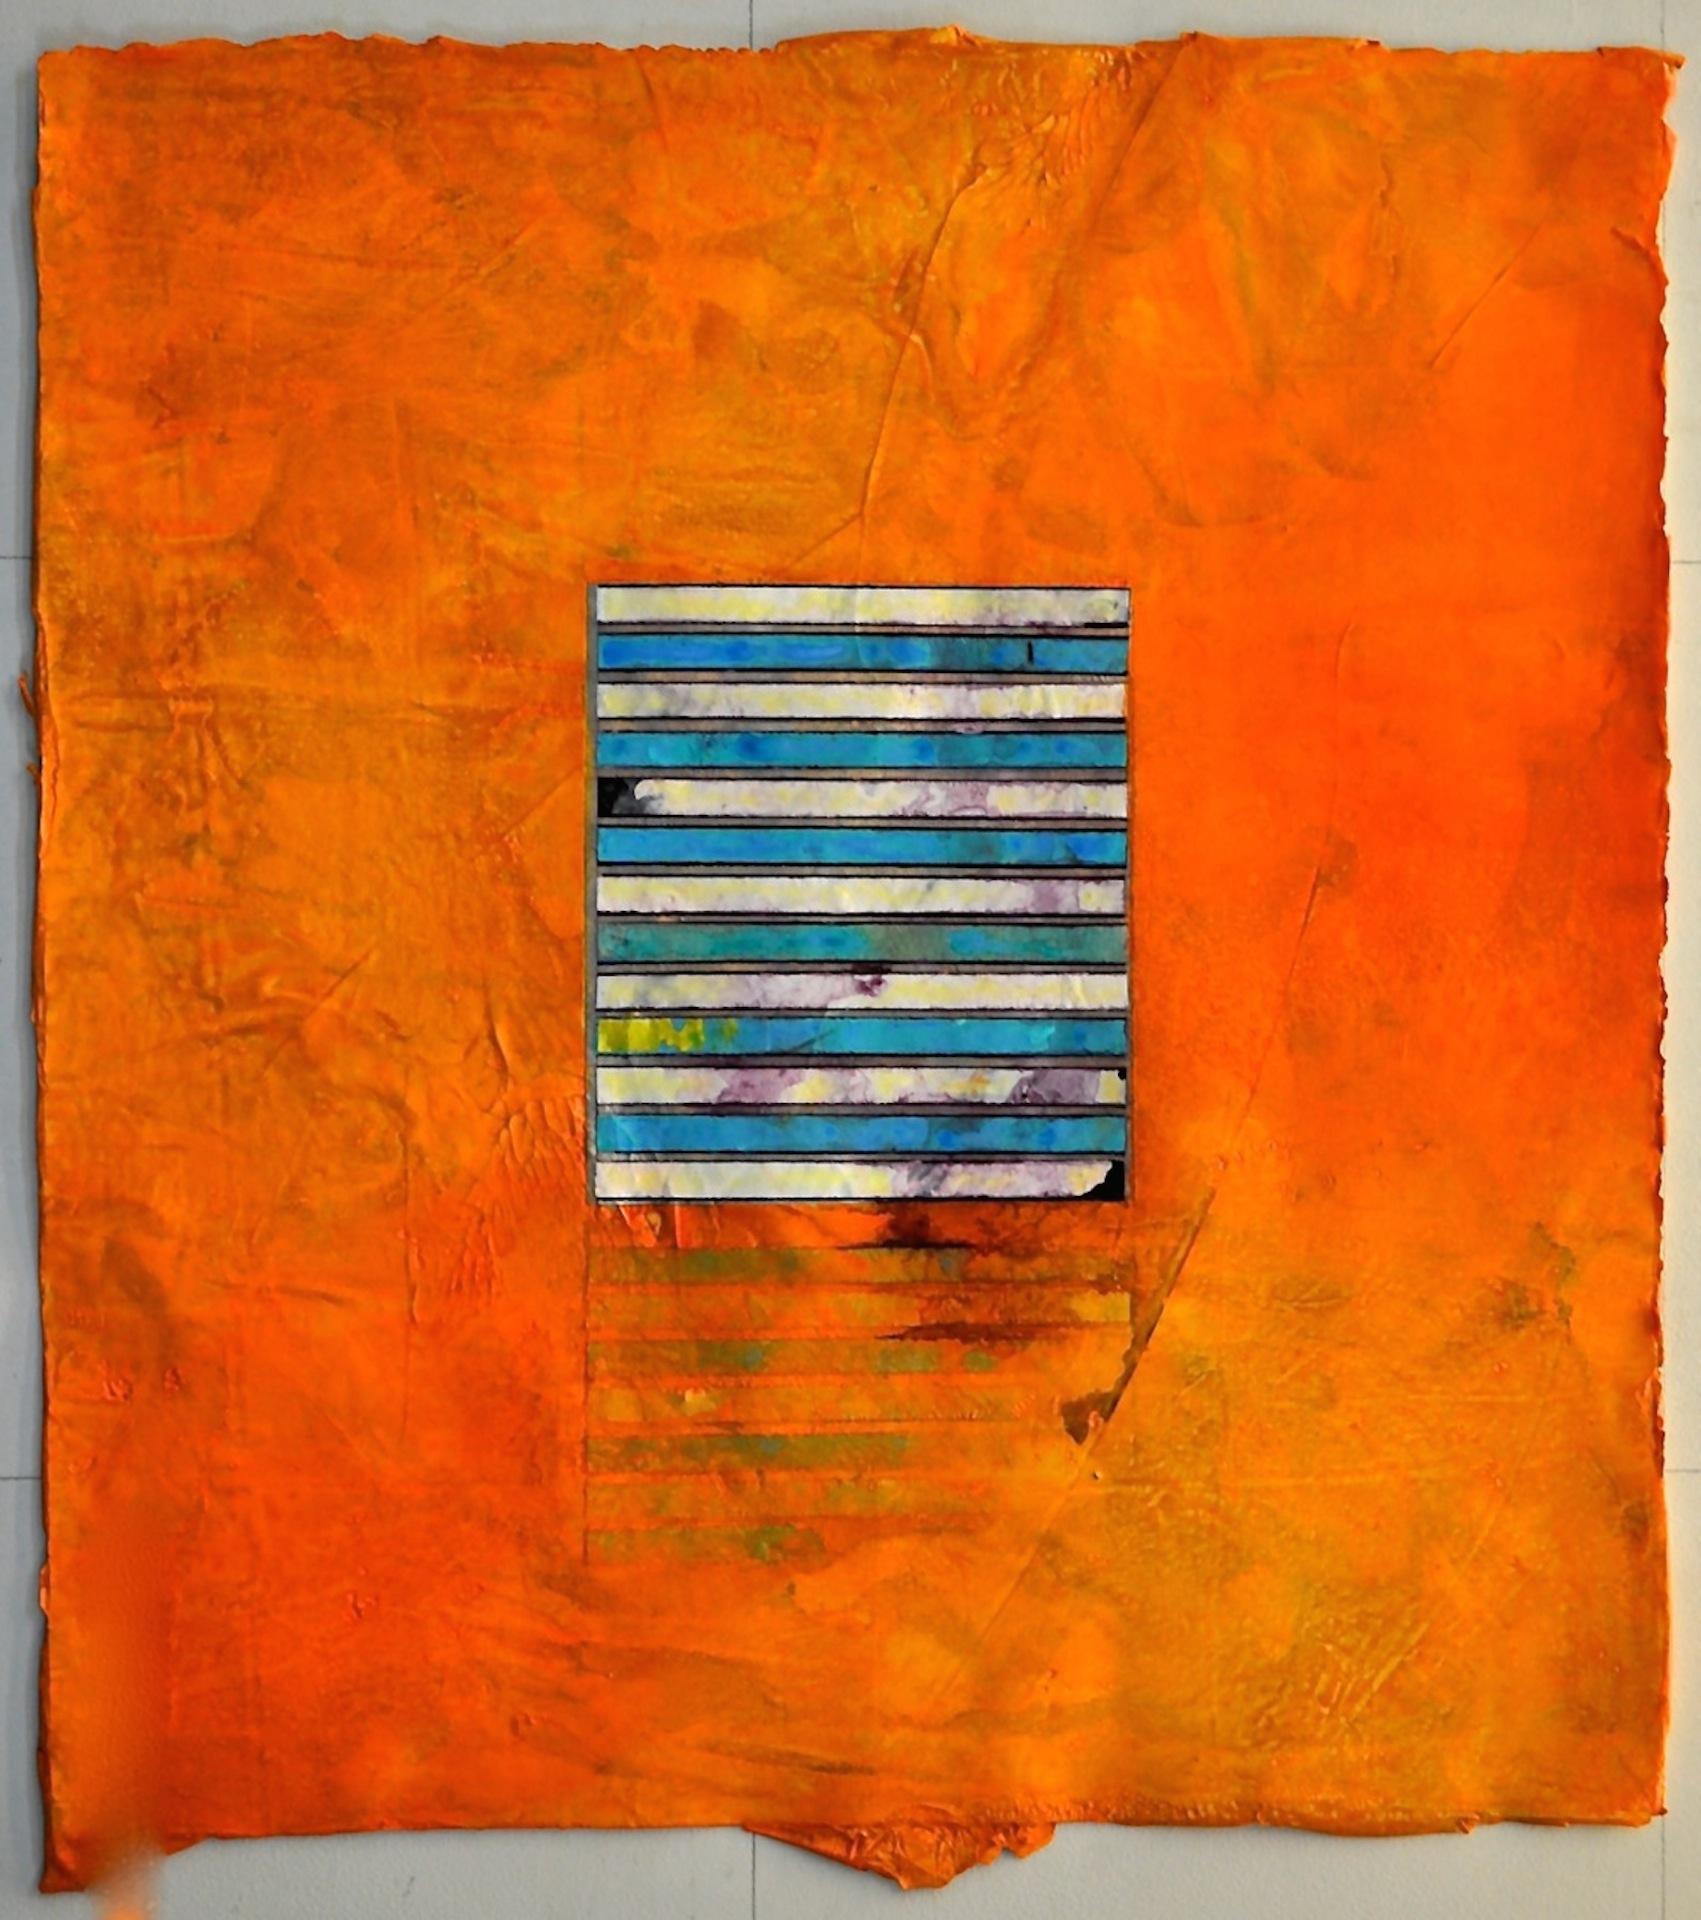 Peter Gooch, Tracks on the Sun